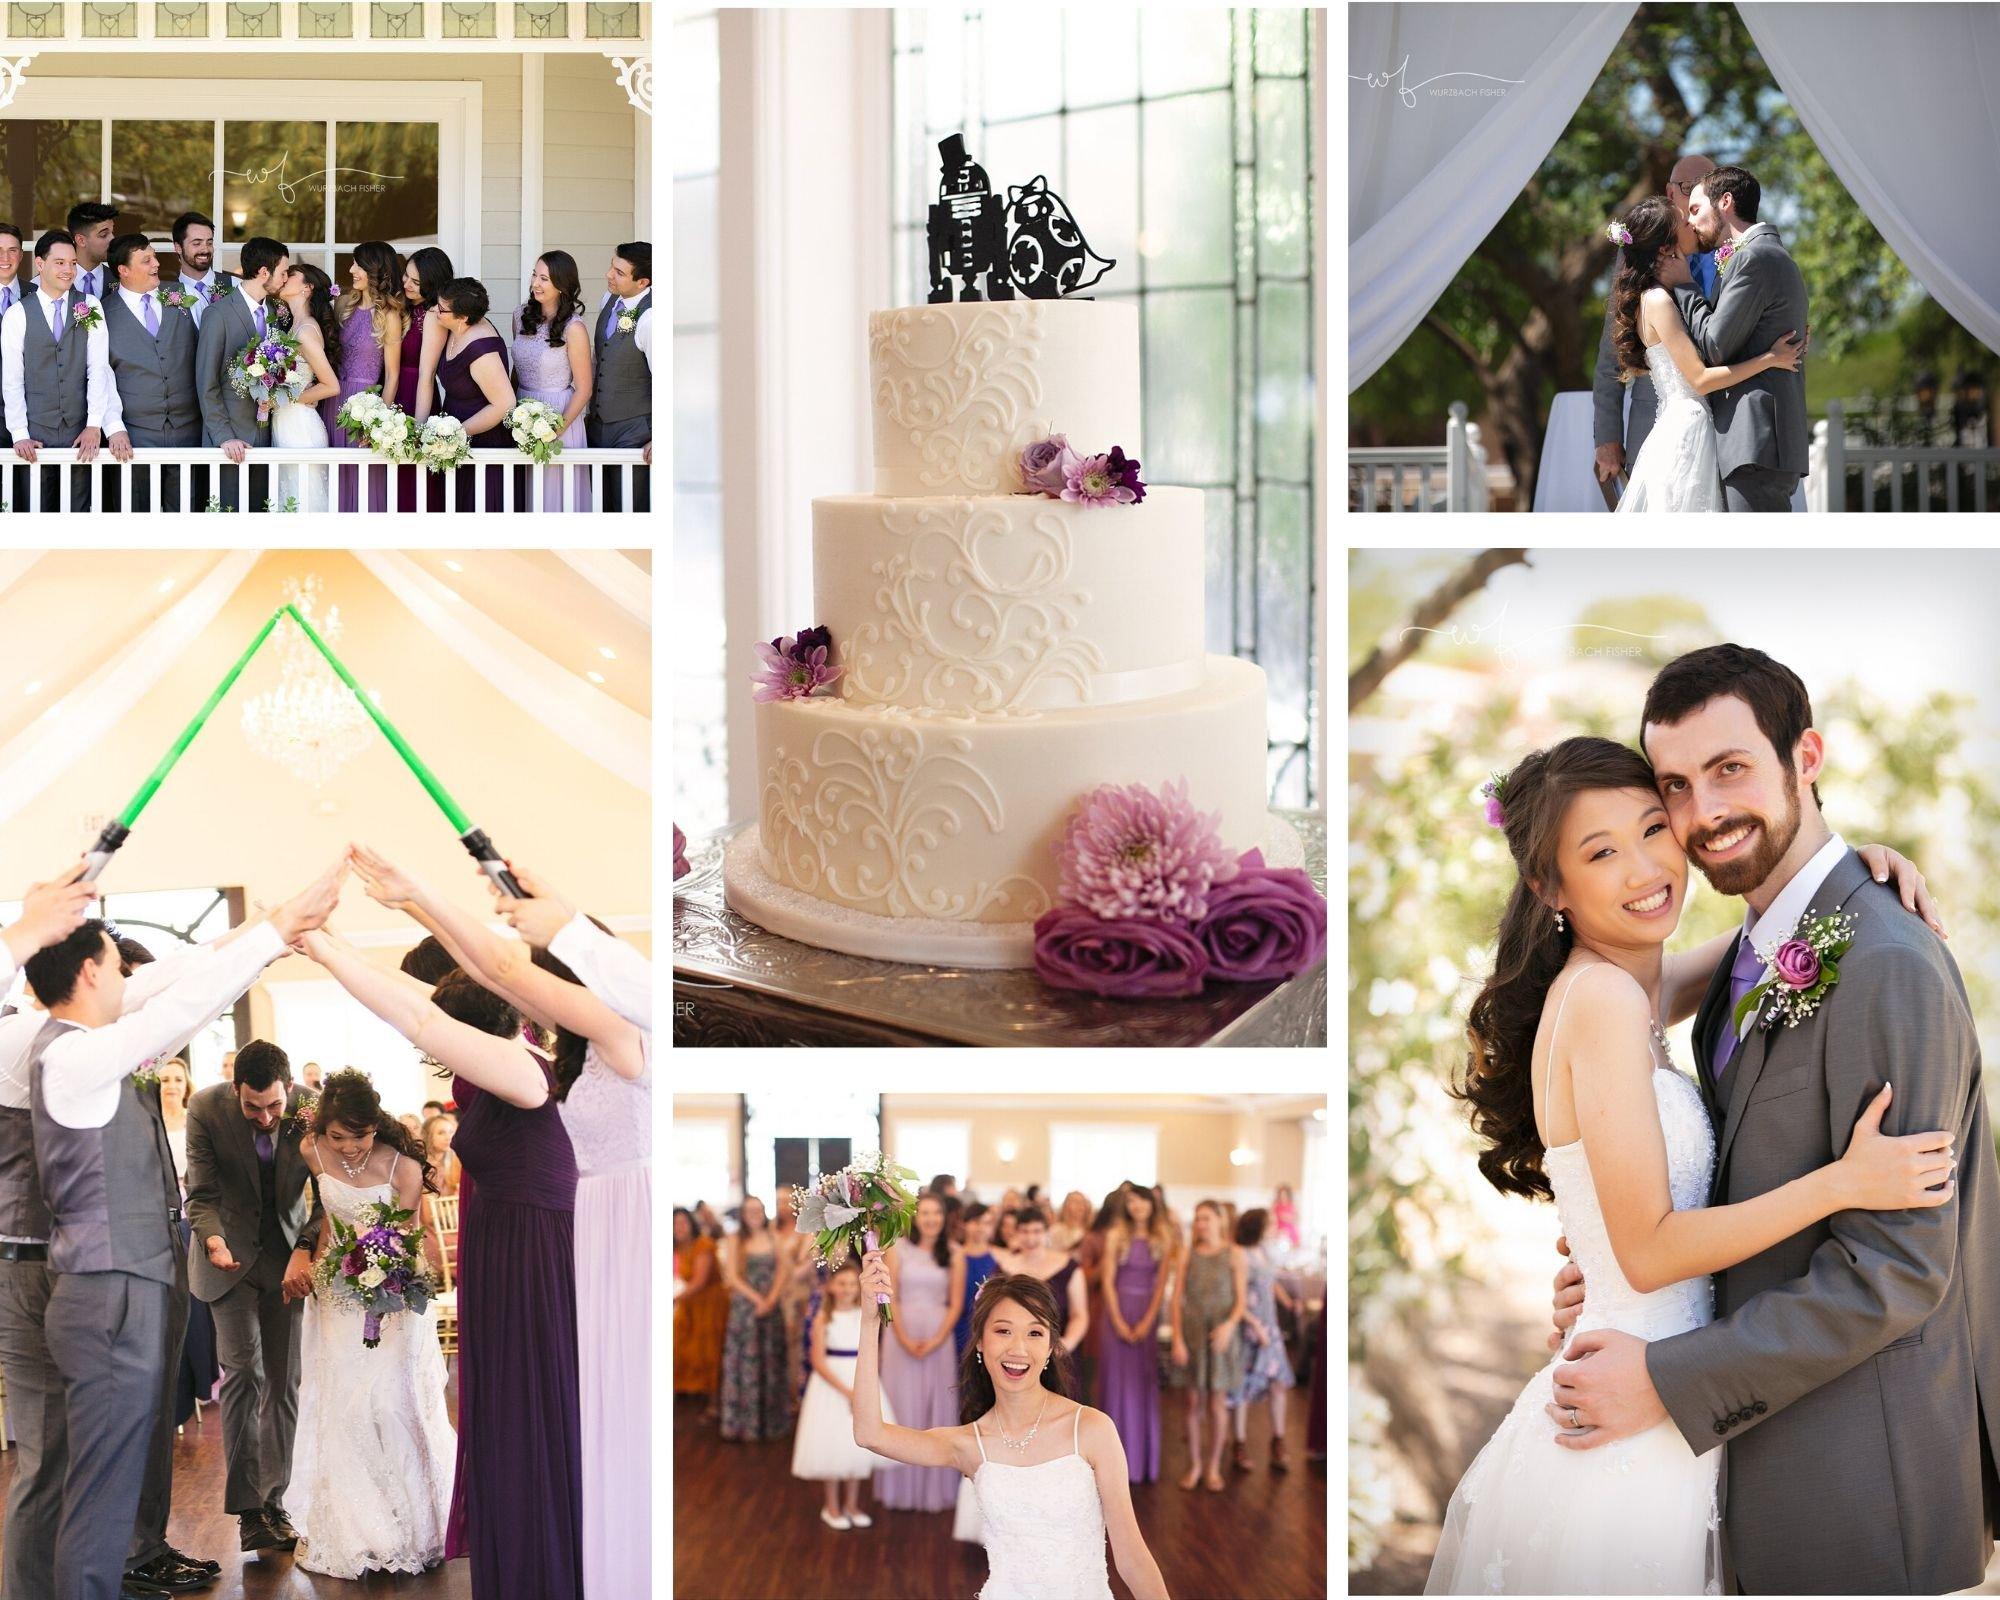 lindsaygrove-starwars-wedding